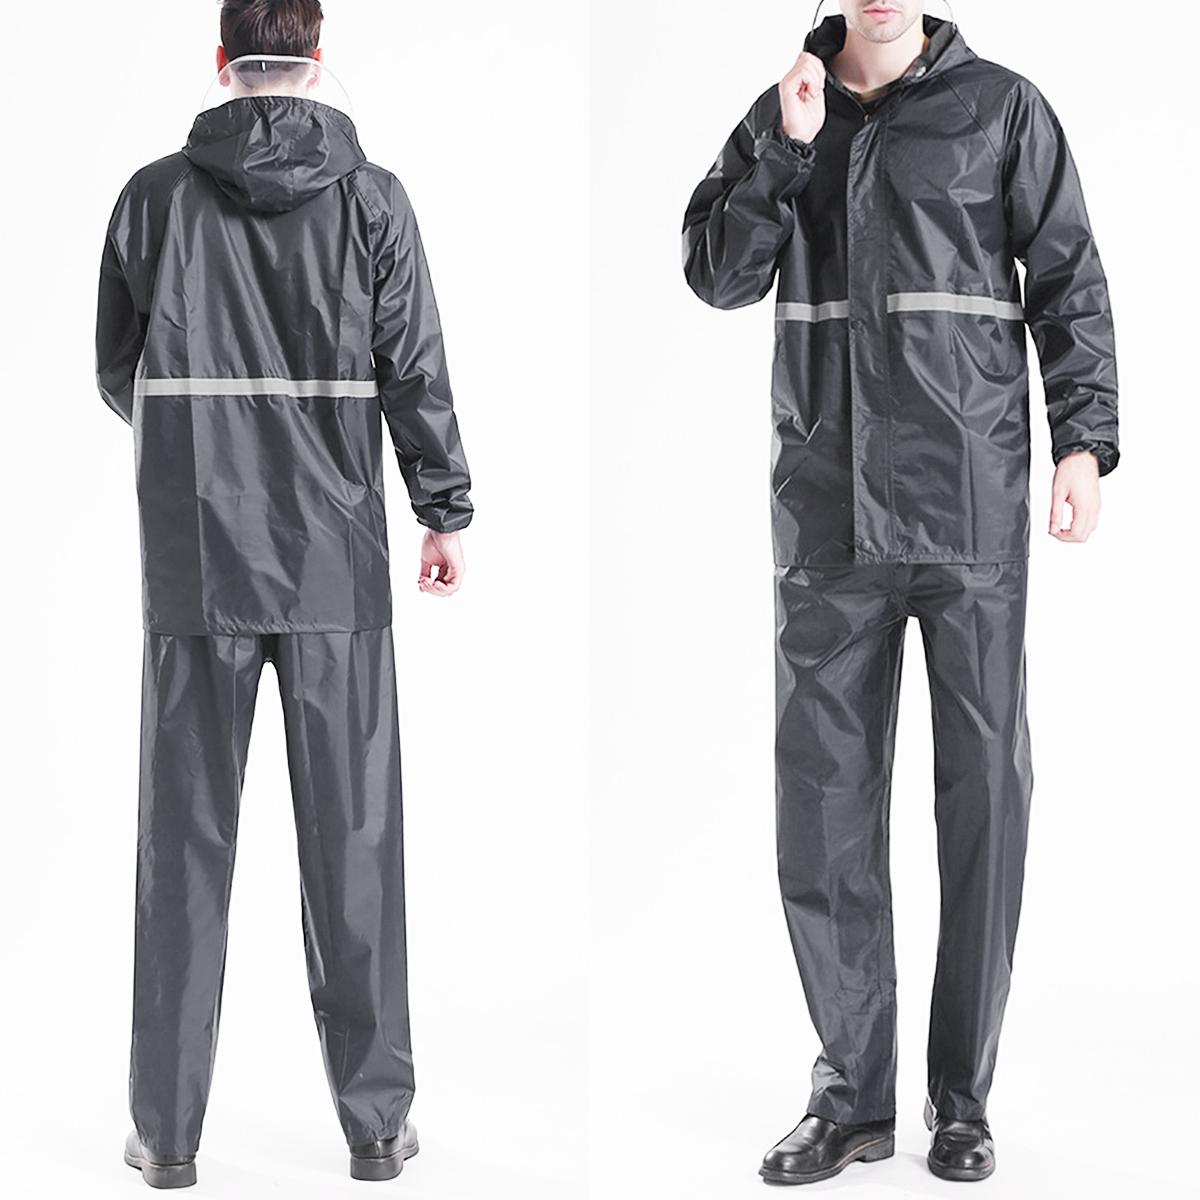 Adult Raincoat Mens Rain Long Pants Anti-UV Riding Cover Rainsuit Jacket & Hat